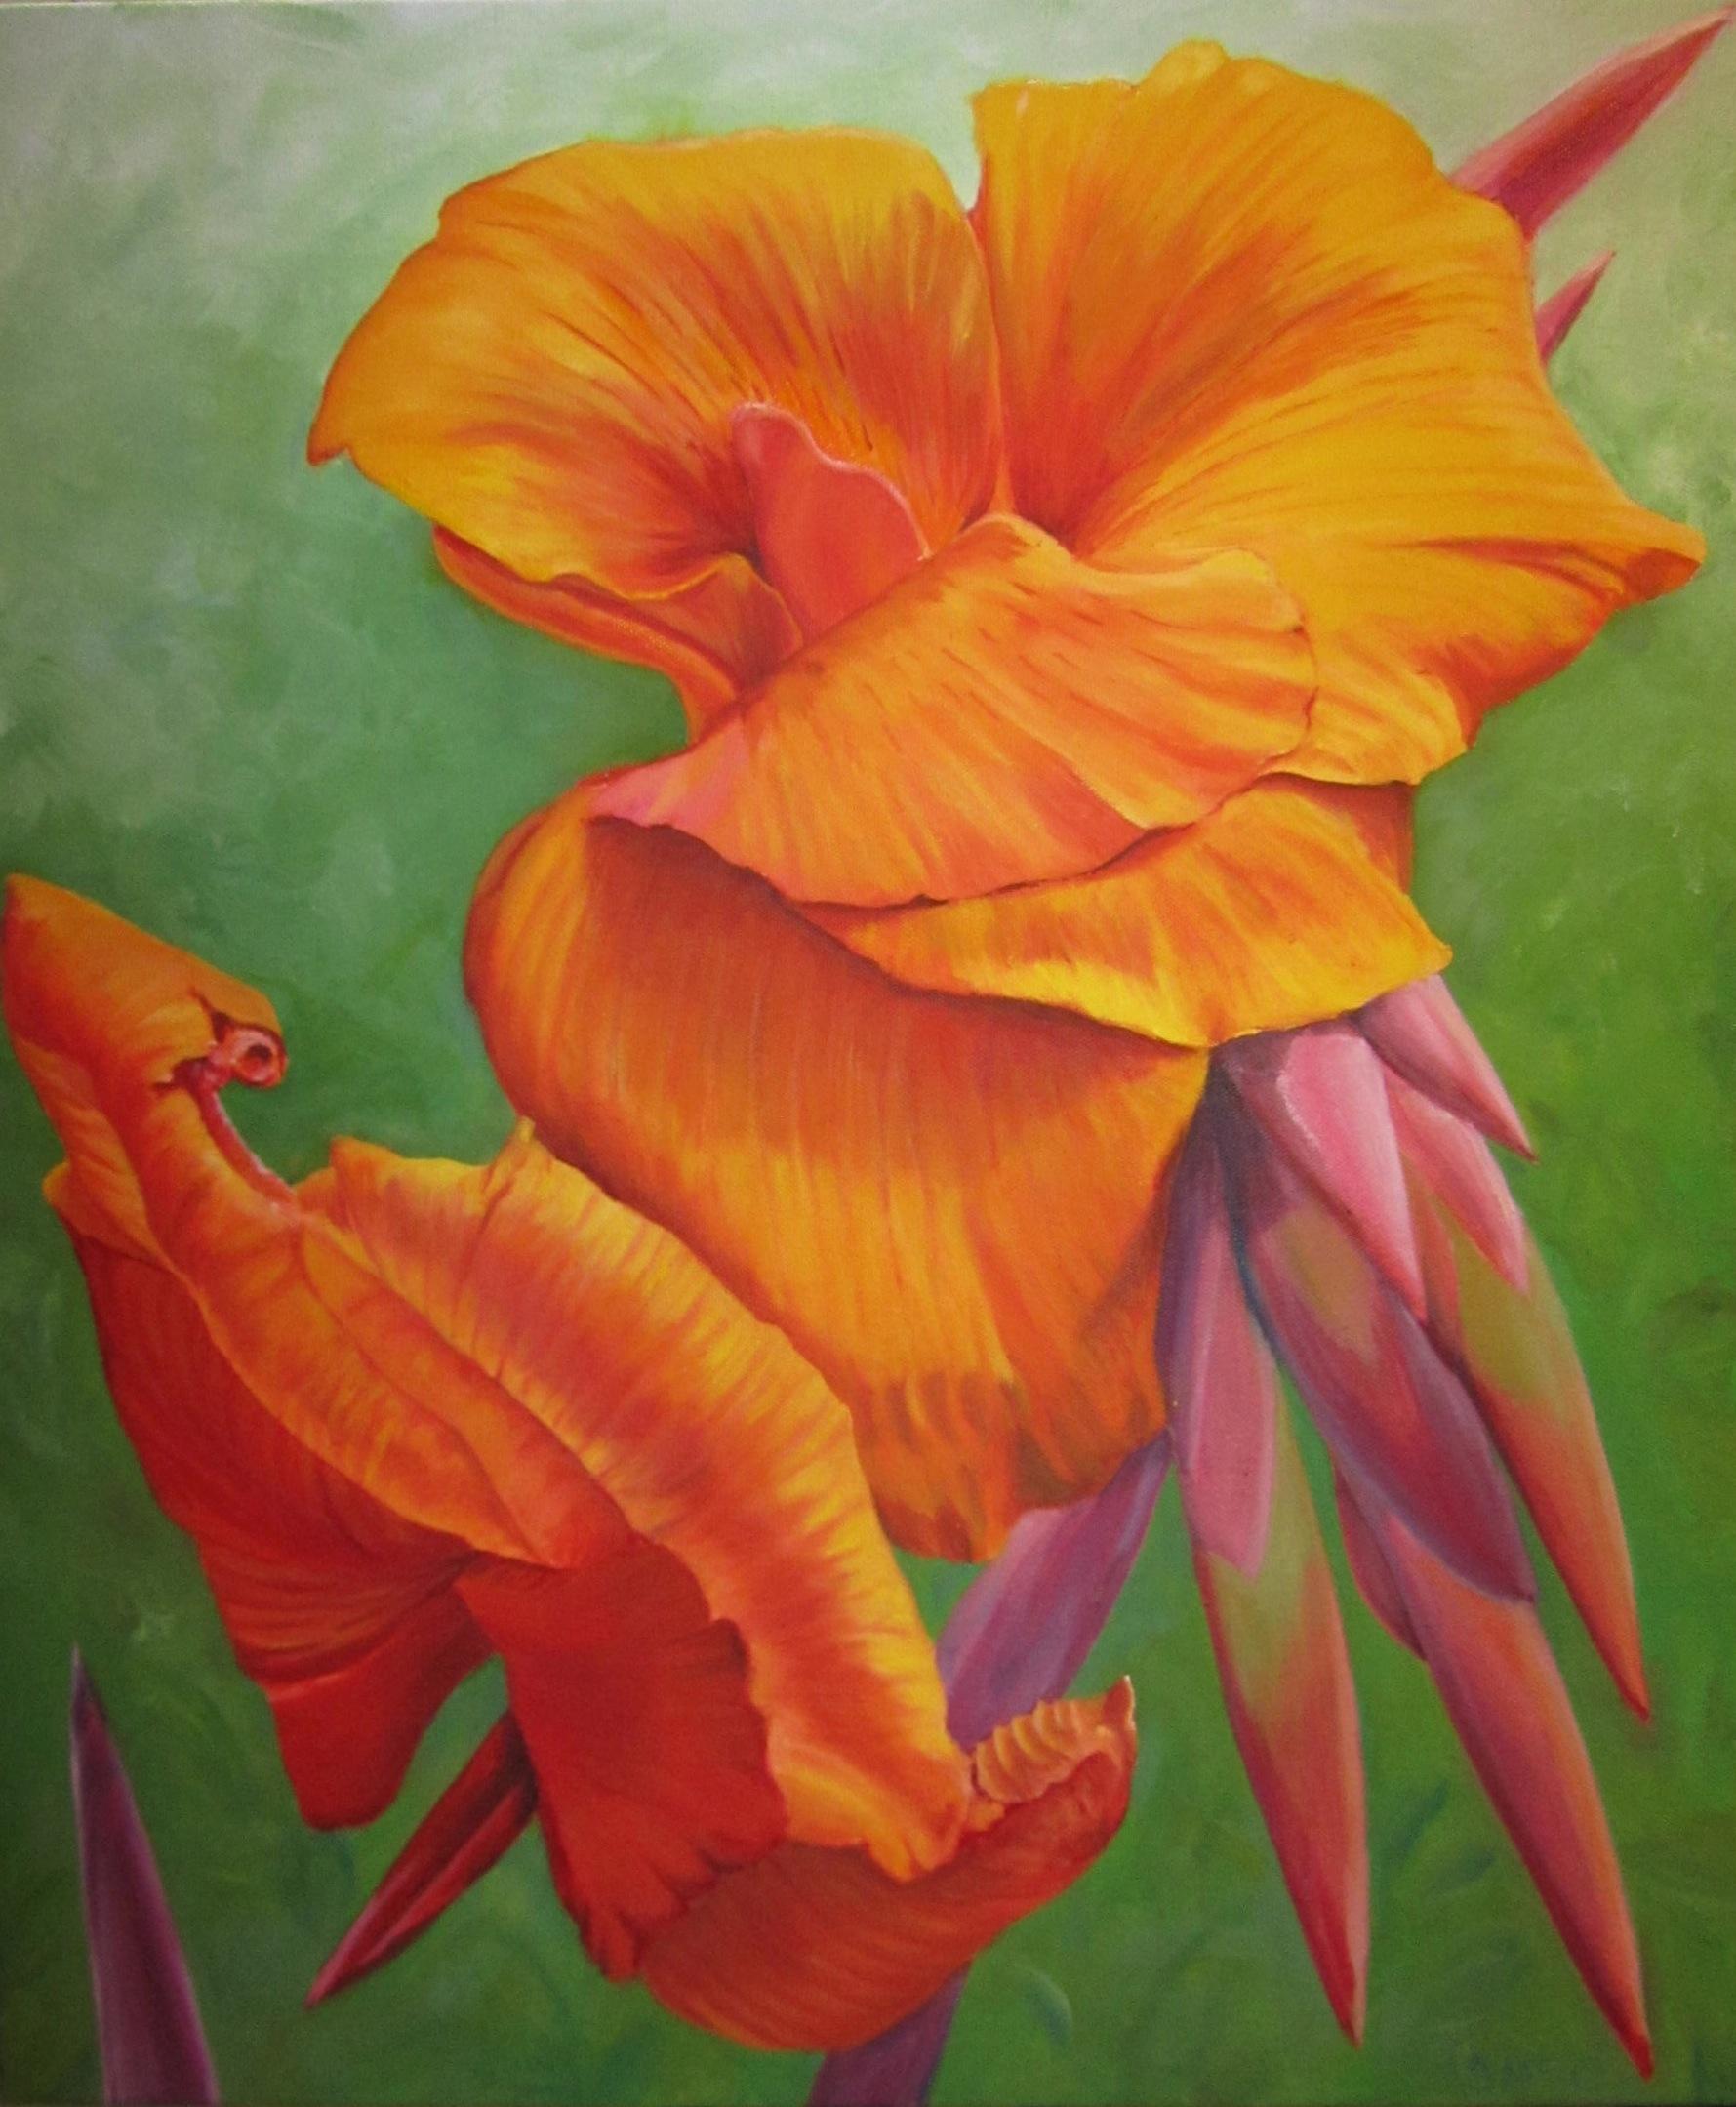 "Orange Canna  oil on canvass; 30"" x 24""; 2016  $300.00"